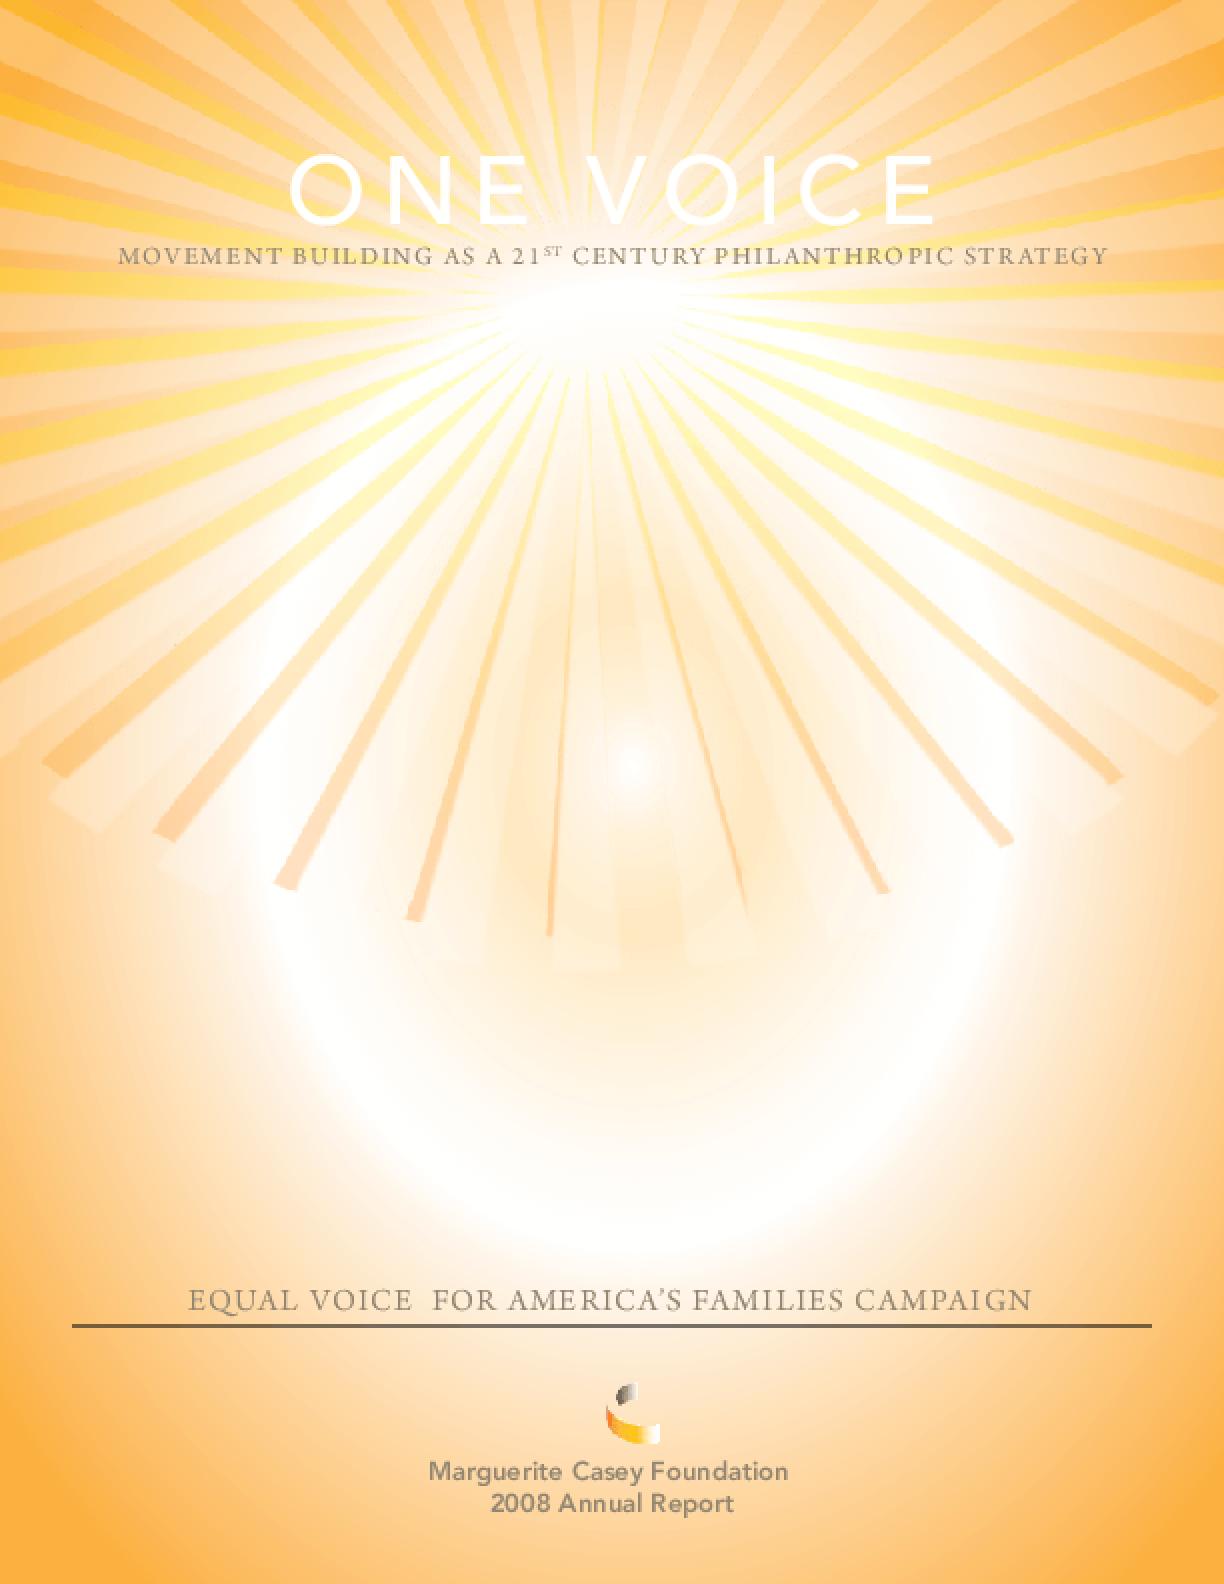 Marguerite Casey Foundation - 2008 Annual Report